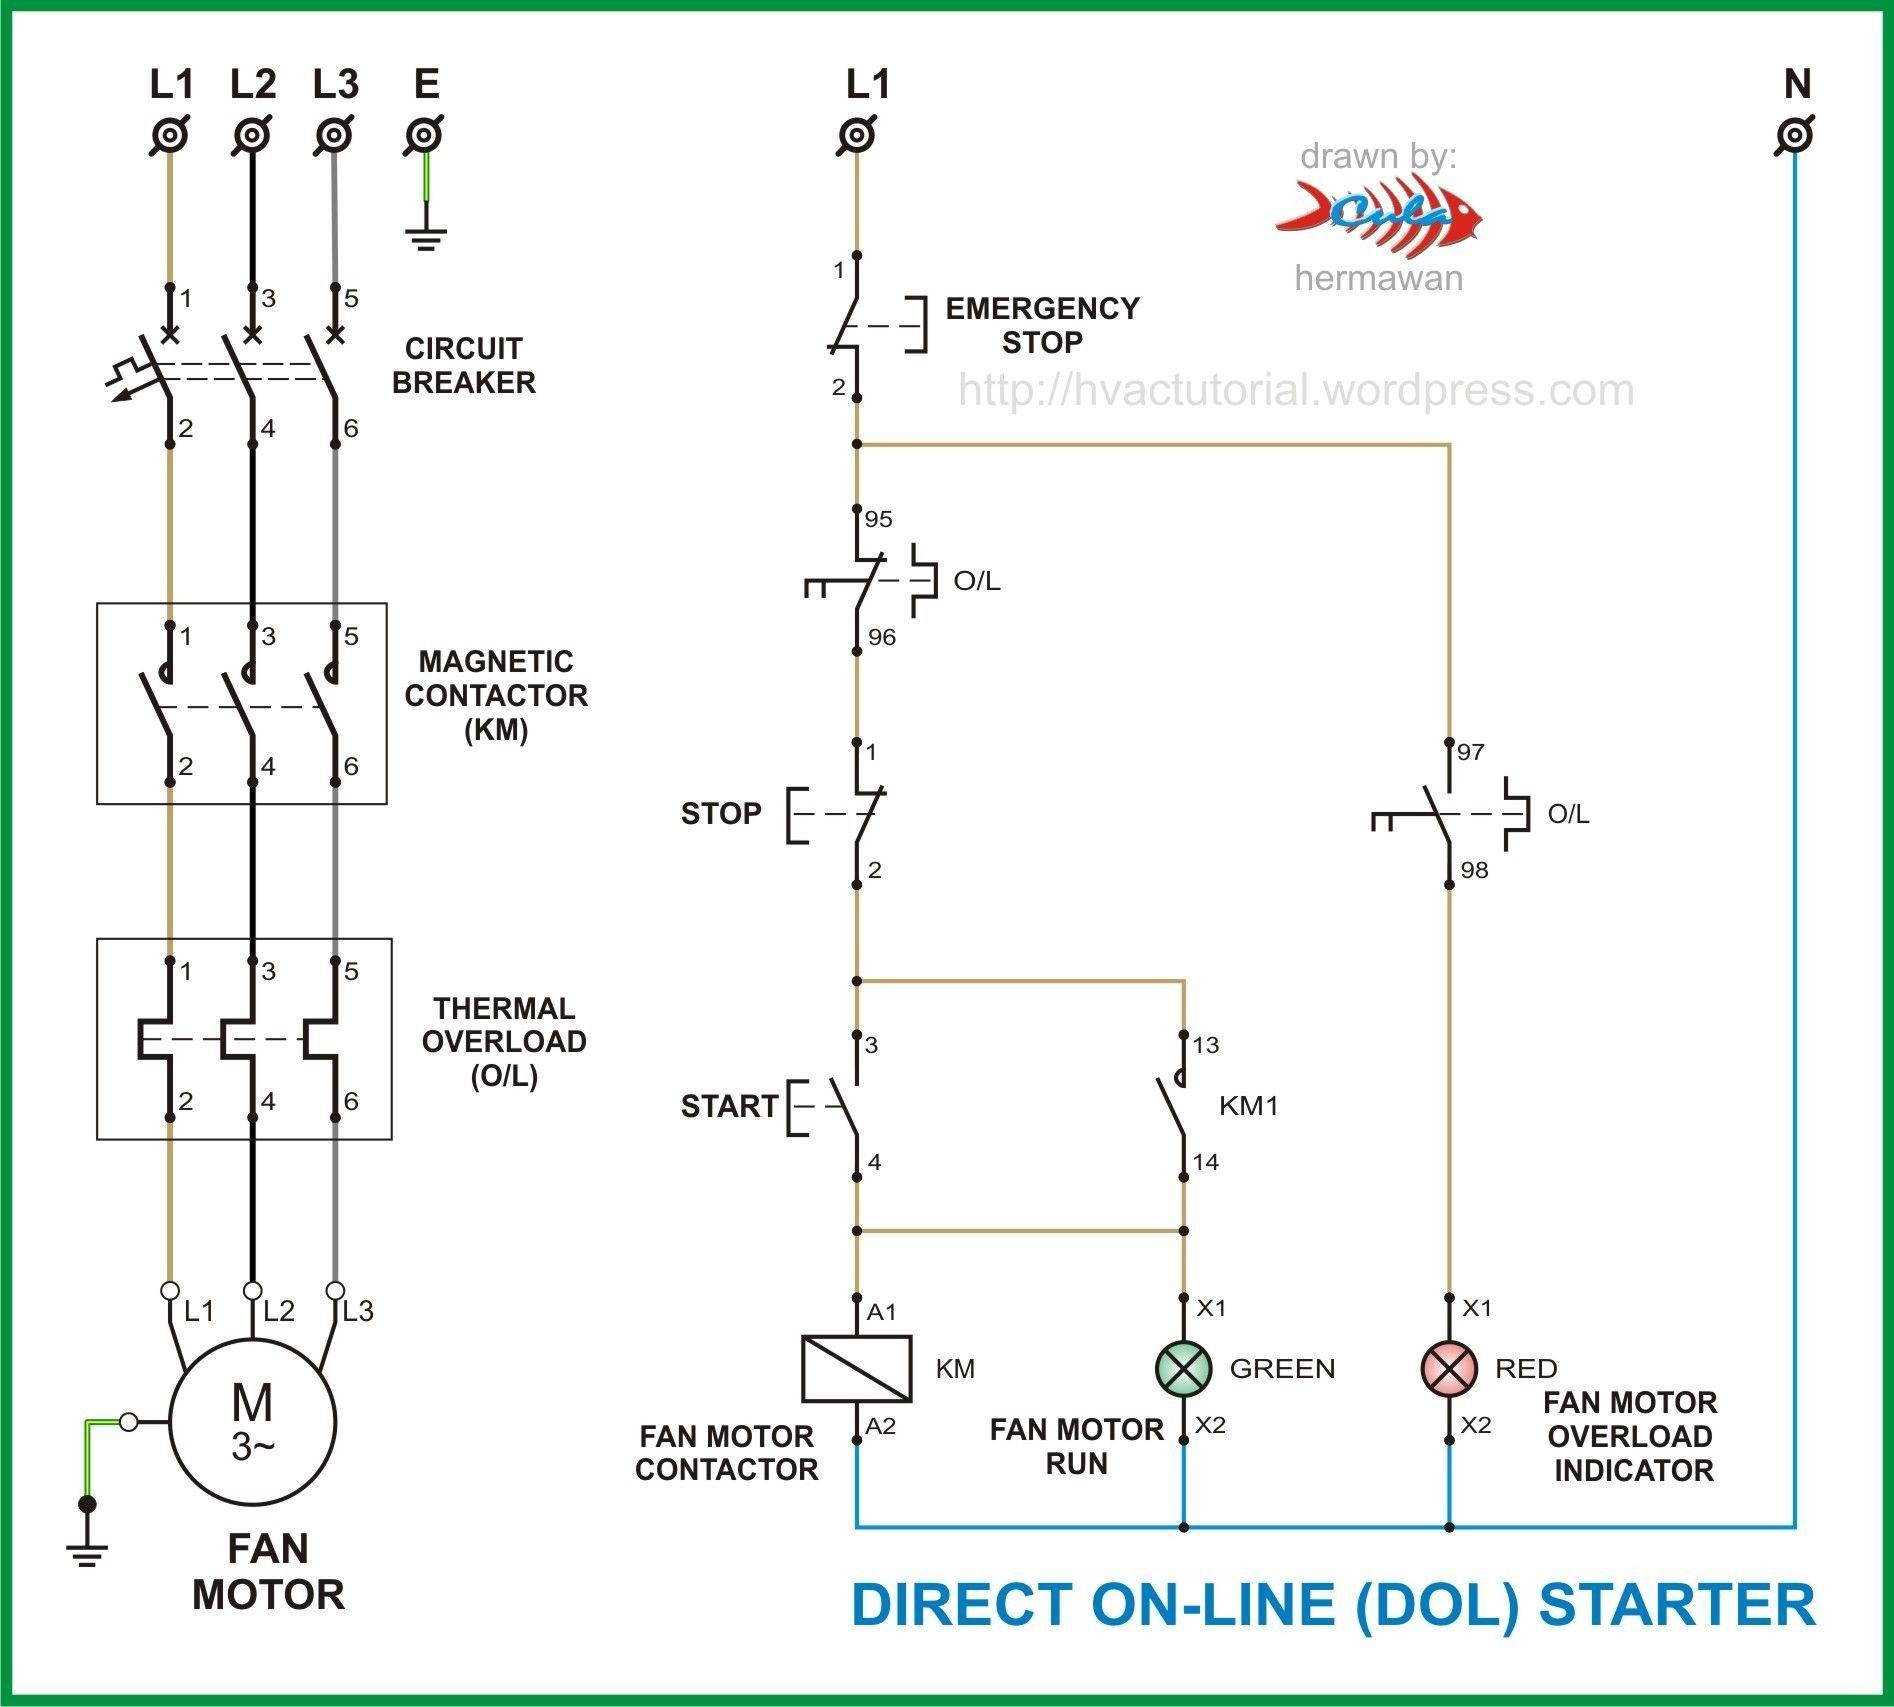 Unique Simple Electrical Circuit Diagram Diagram Wiringdiagram Diagramming Diagramm Visuals V Electrical Circuit Diagram Circuit Diagram Electric Circuit